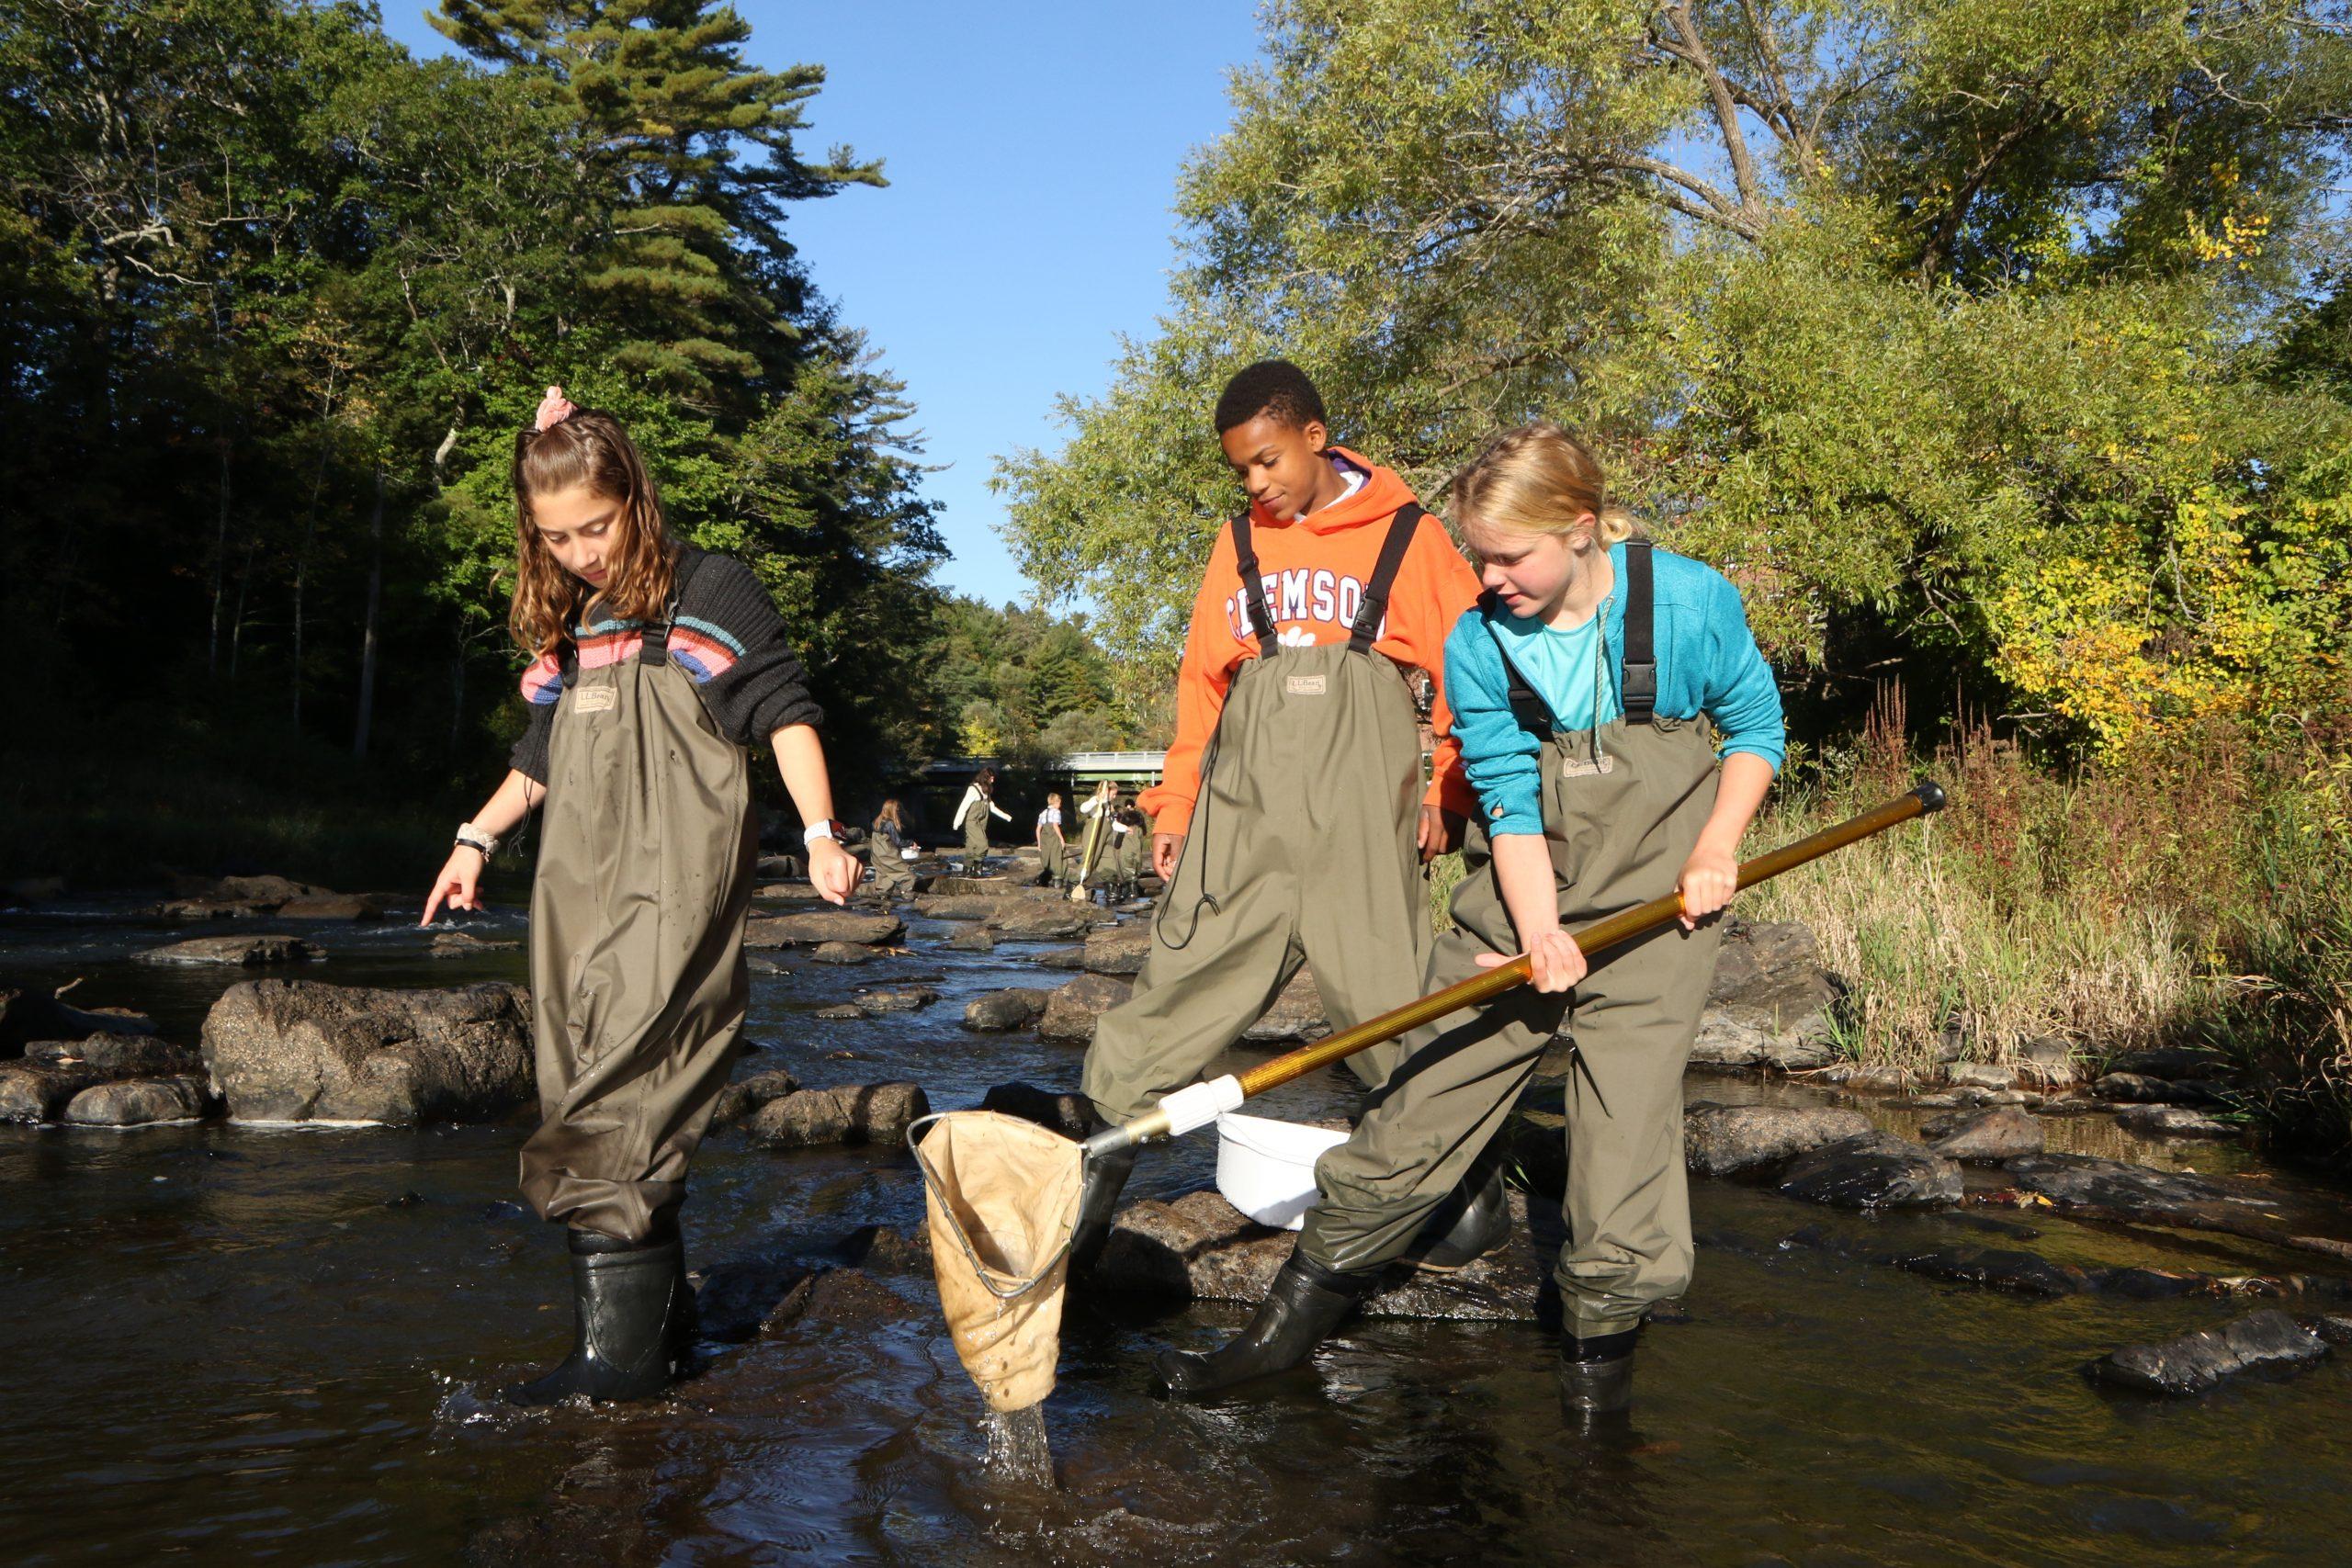 NYA studets fishing in the Royal River